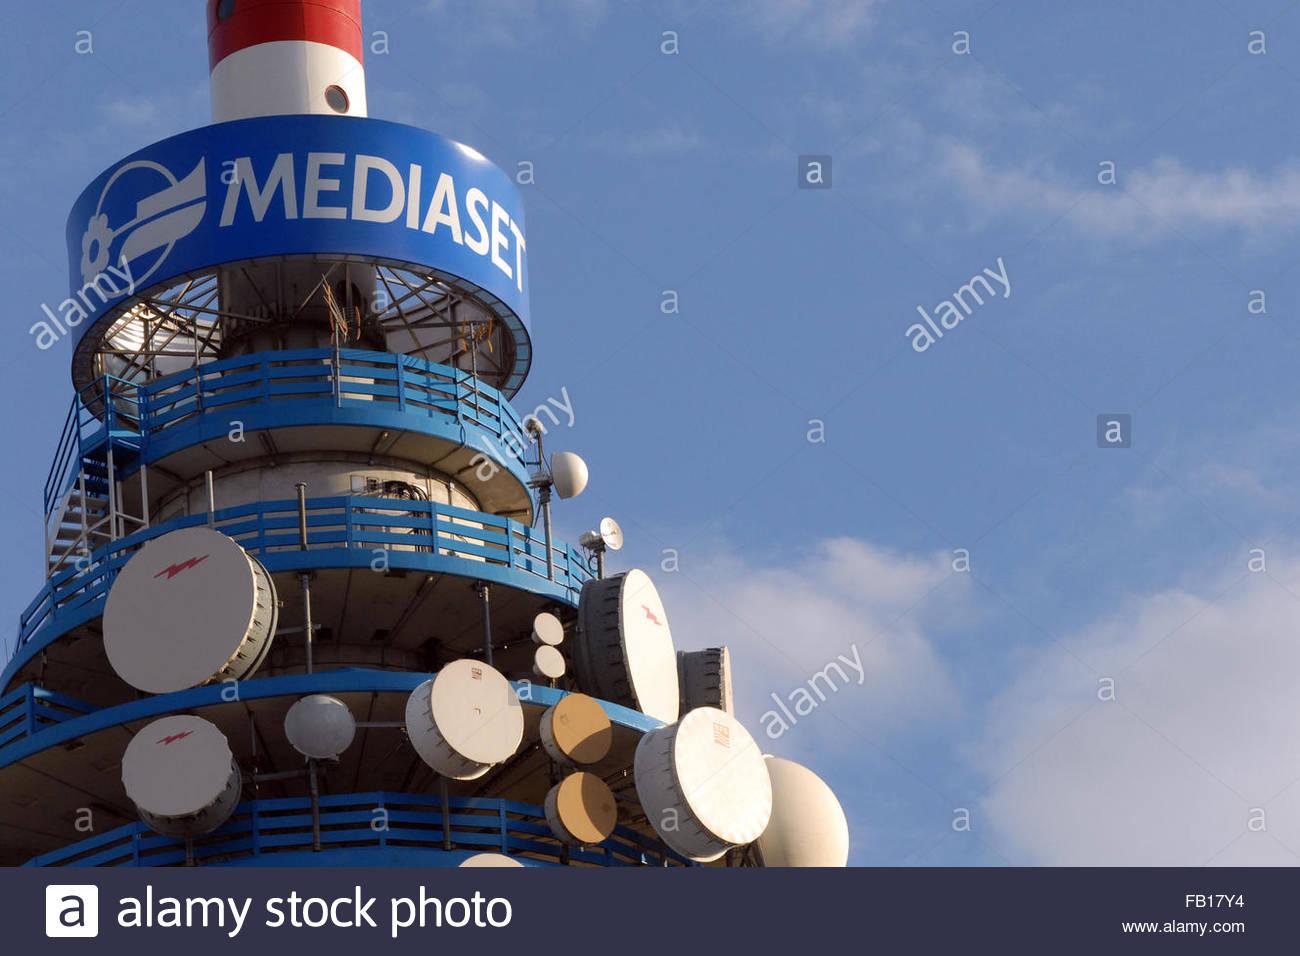 repeater mediaset - Stock Image